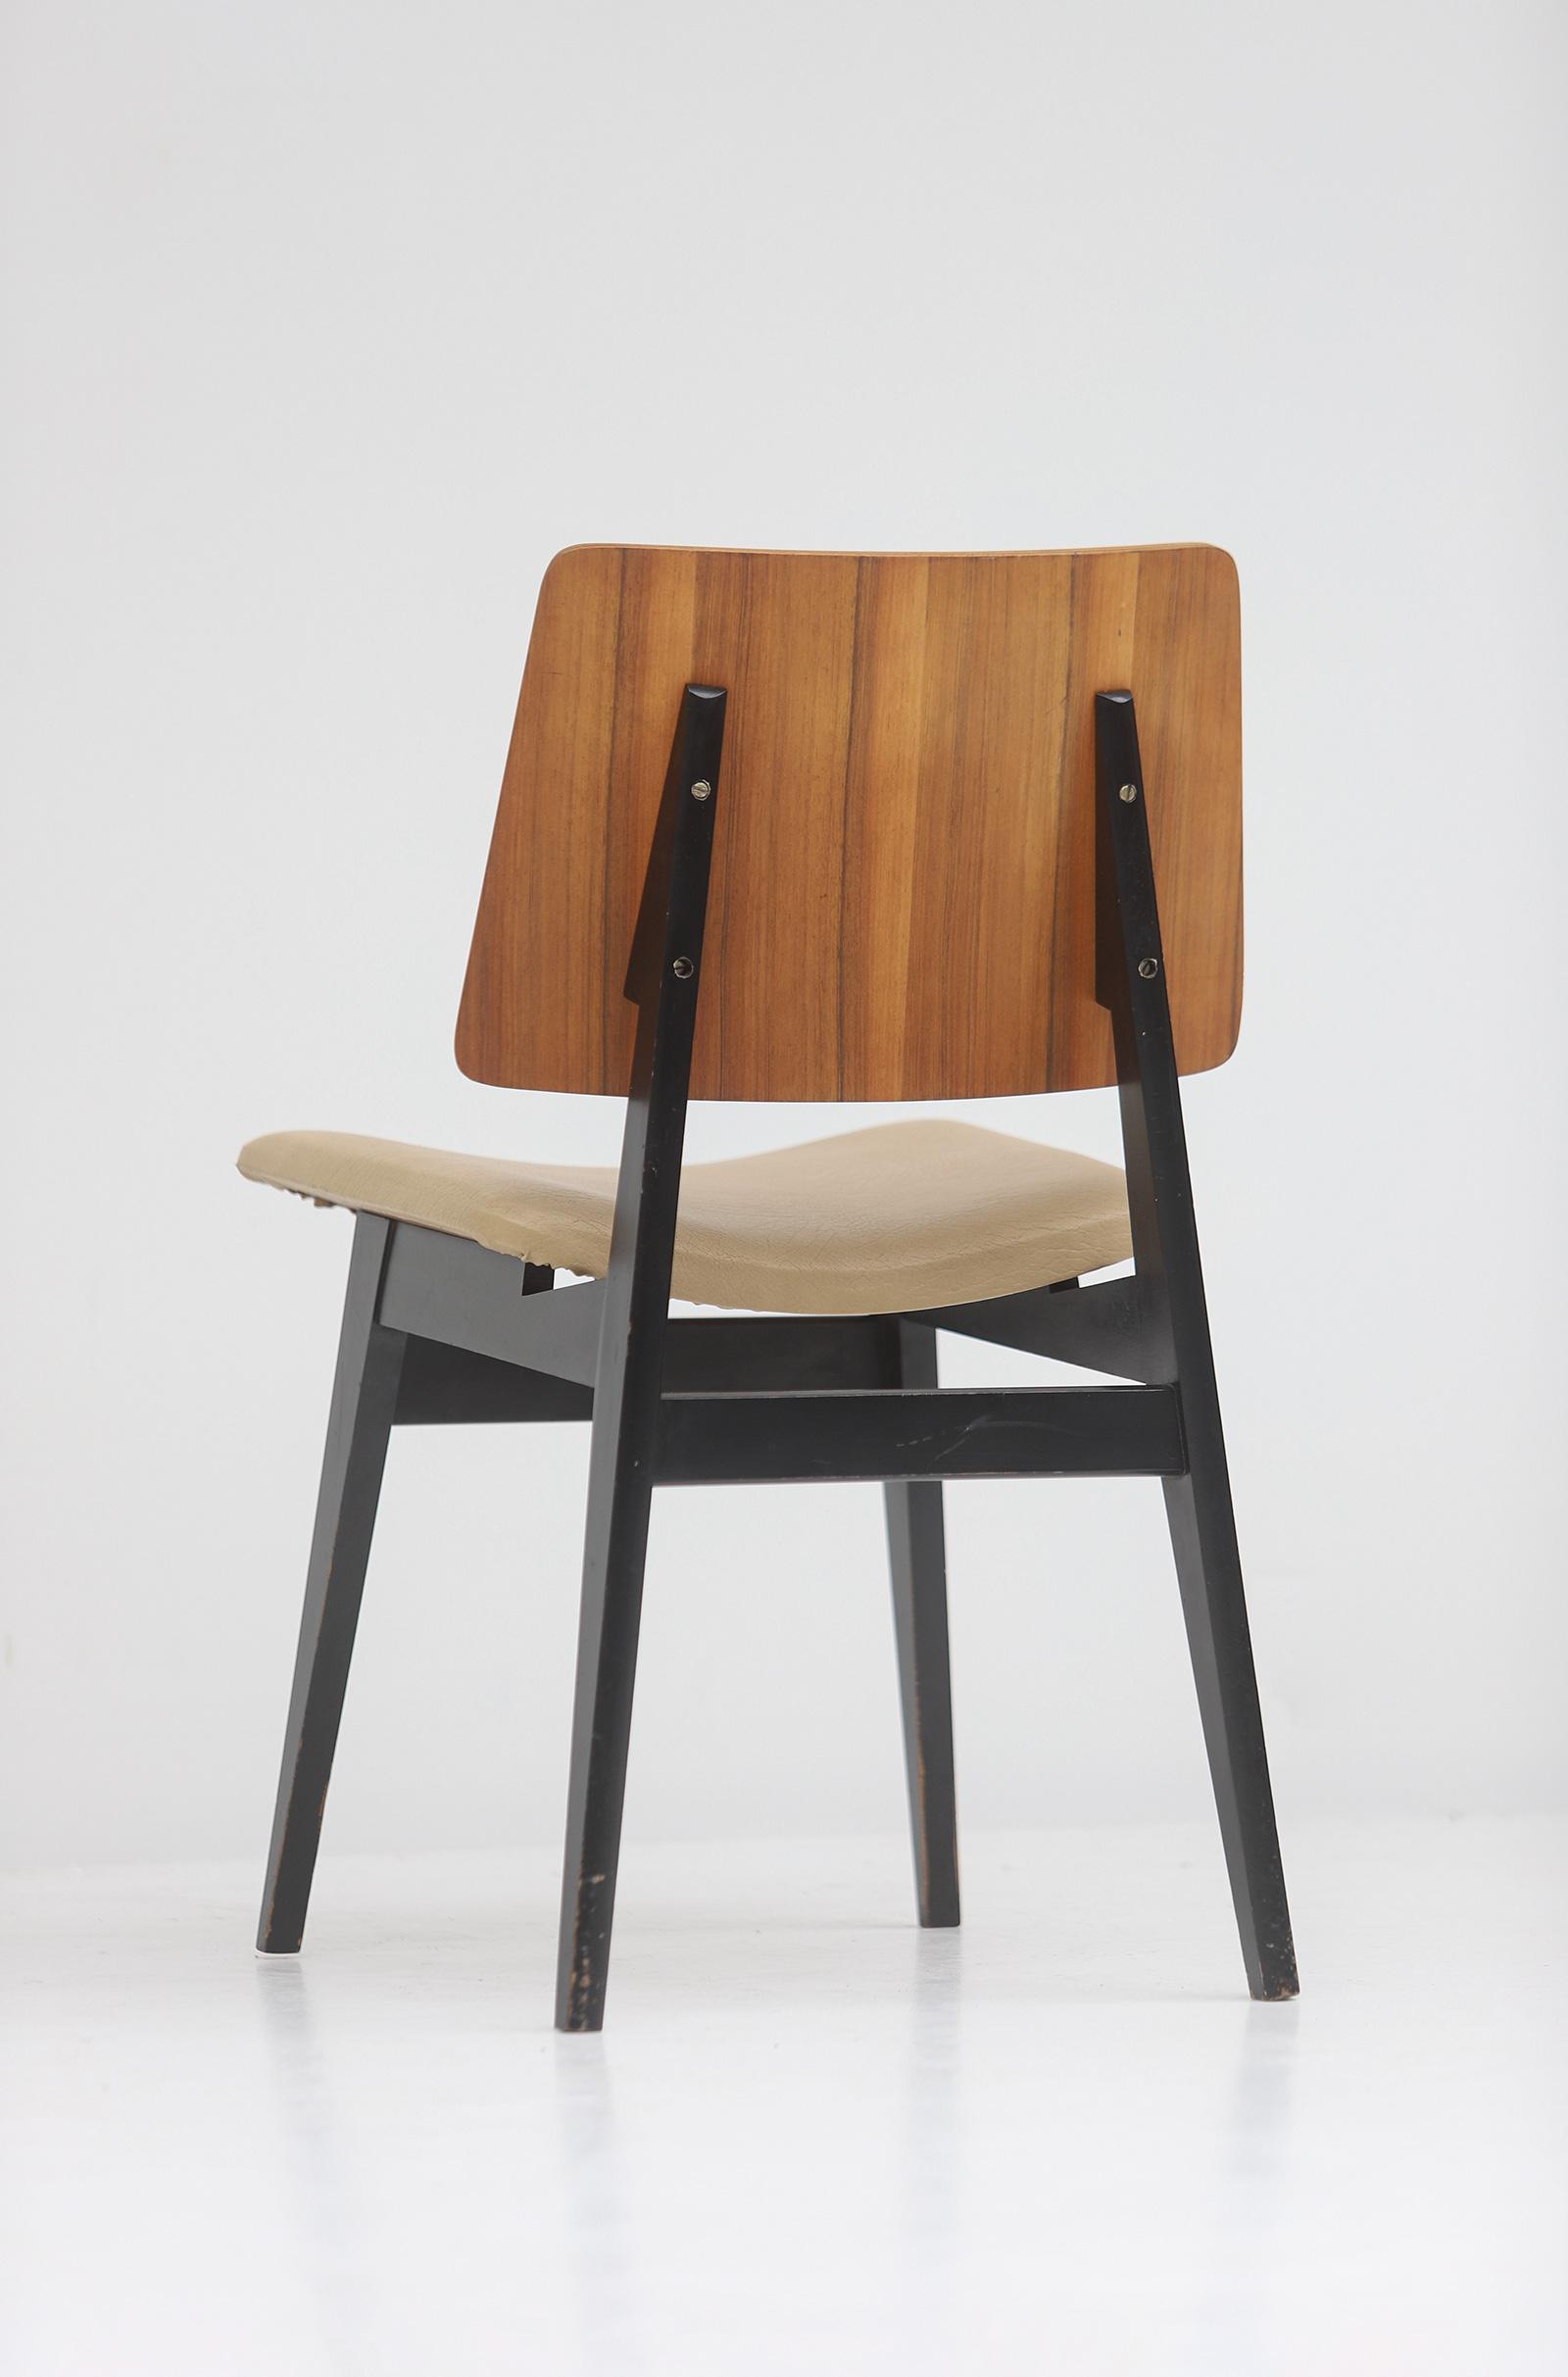 Luxus Jos De Mey Dining Chairsimage 10